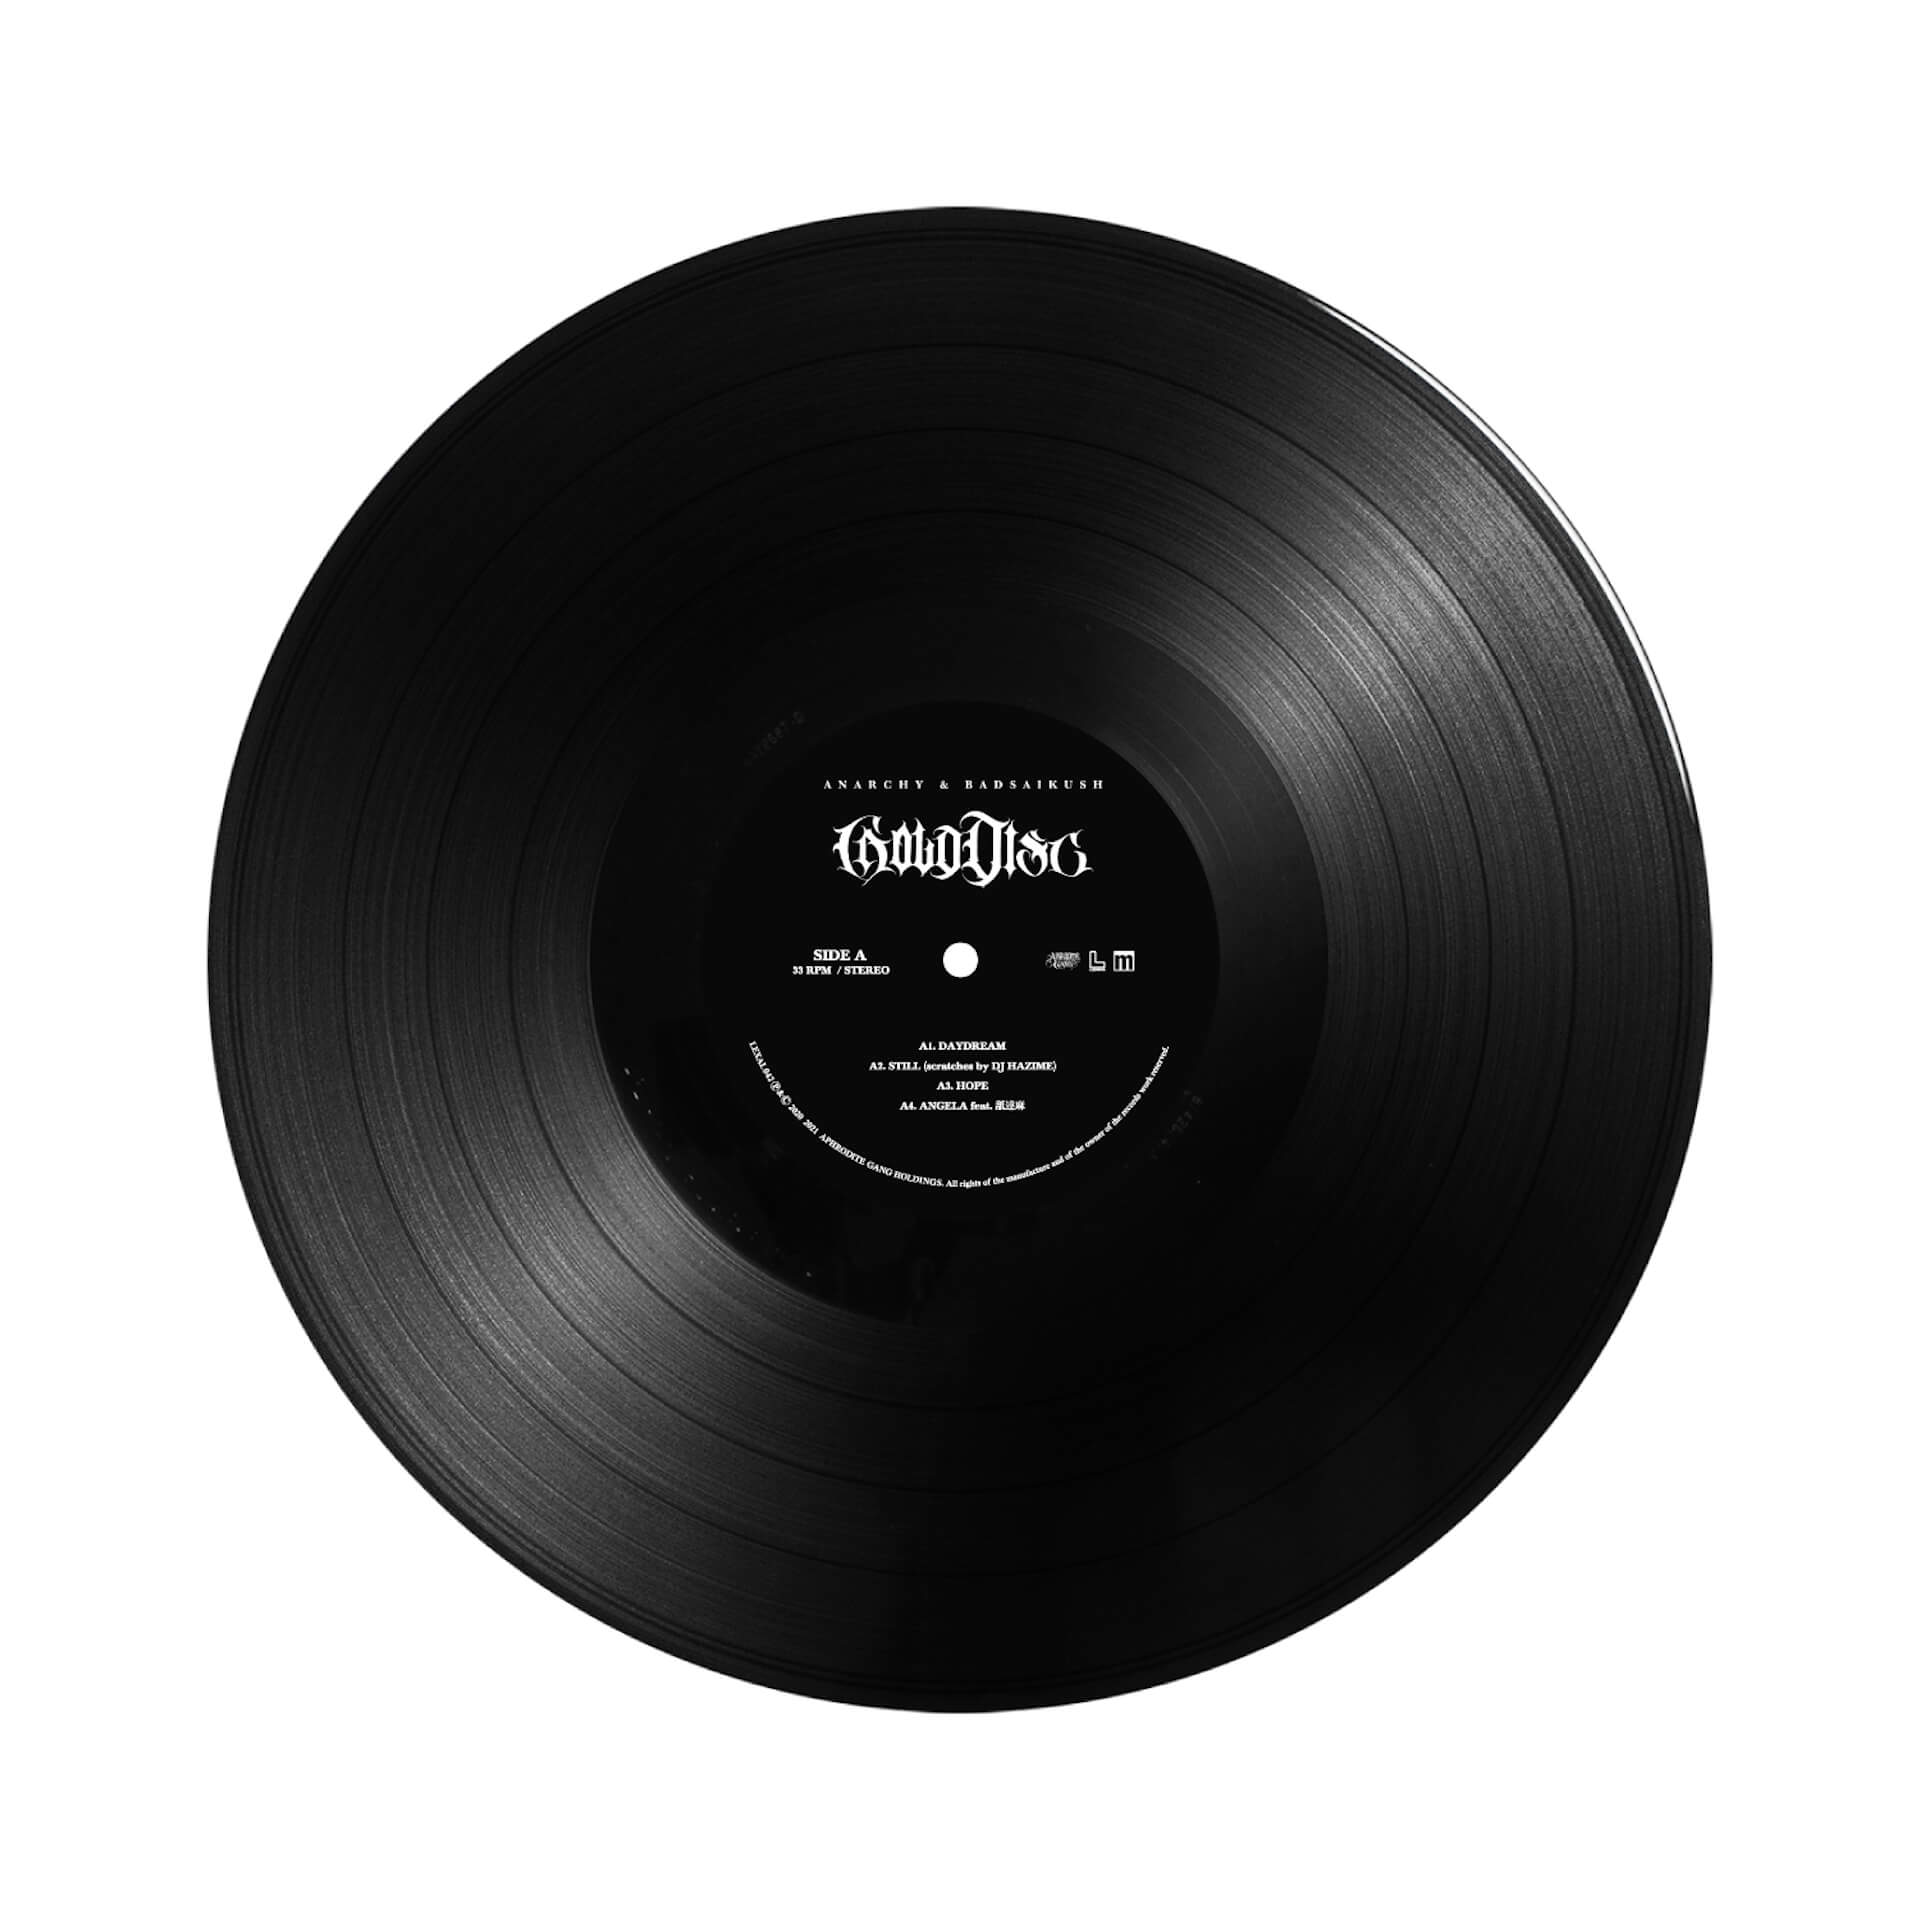 ANARCHYとBADASAIKUSHのコラボEP『GOLD DISC』がアナログ化決定!GREEN ASSASSIN DOLLARが手がけたインストも収録 music210107_anarchy_badasaikush_1